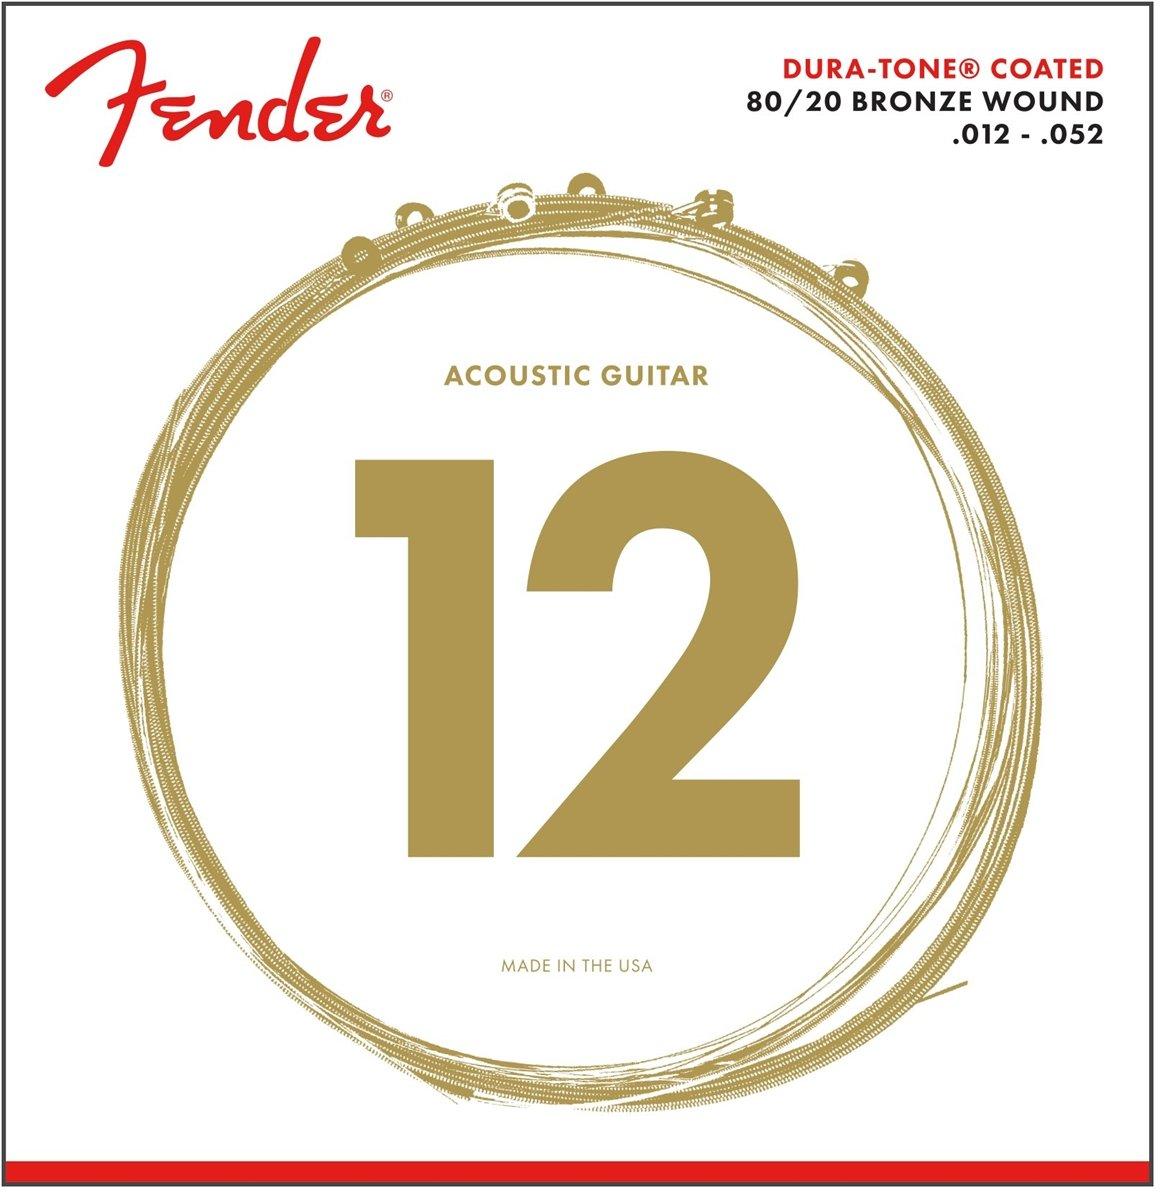 Fender Dura-Tone Coated Acoustic 880L 12-52: Amazon.es: Instrumentos musicales